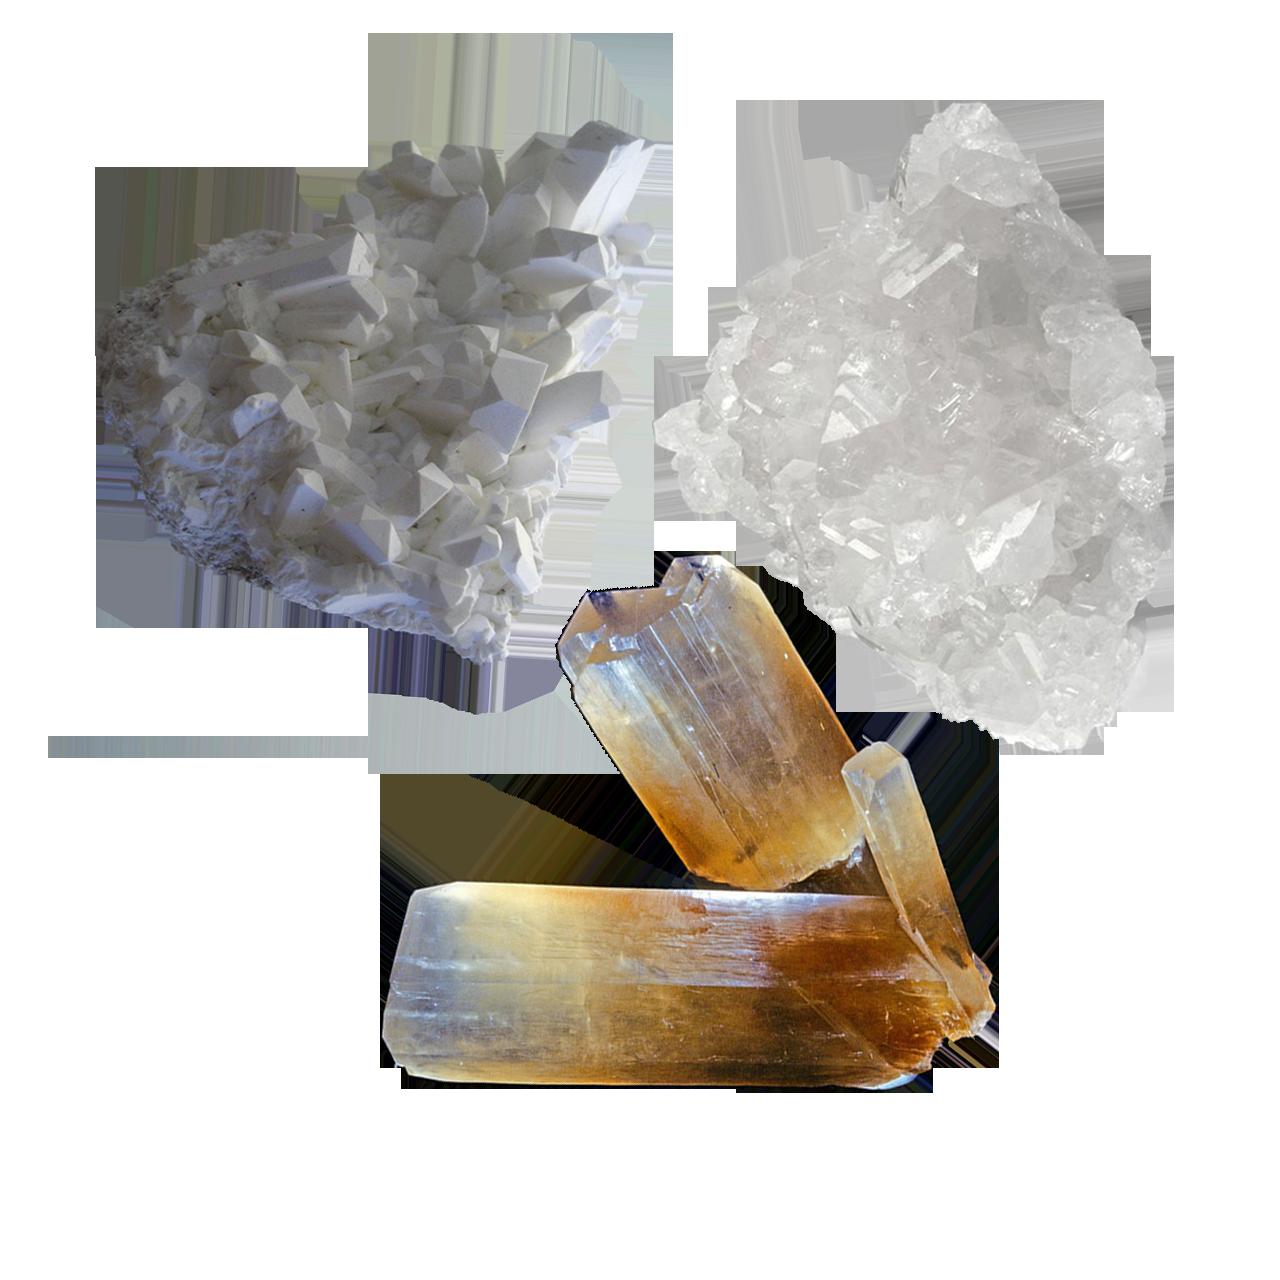 Cristale borax